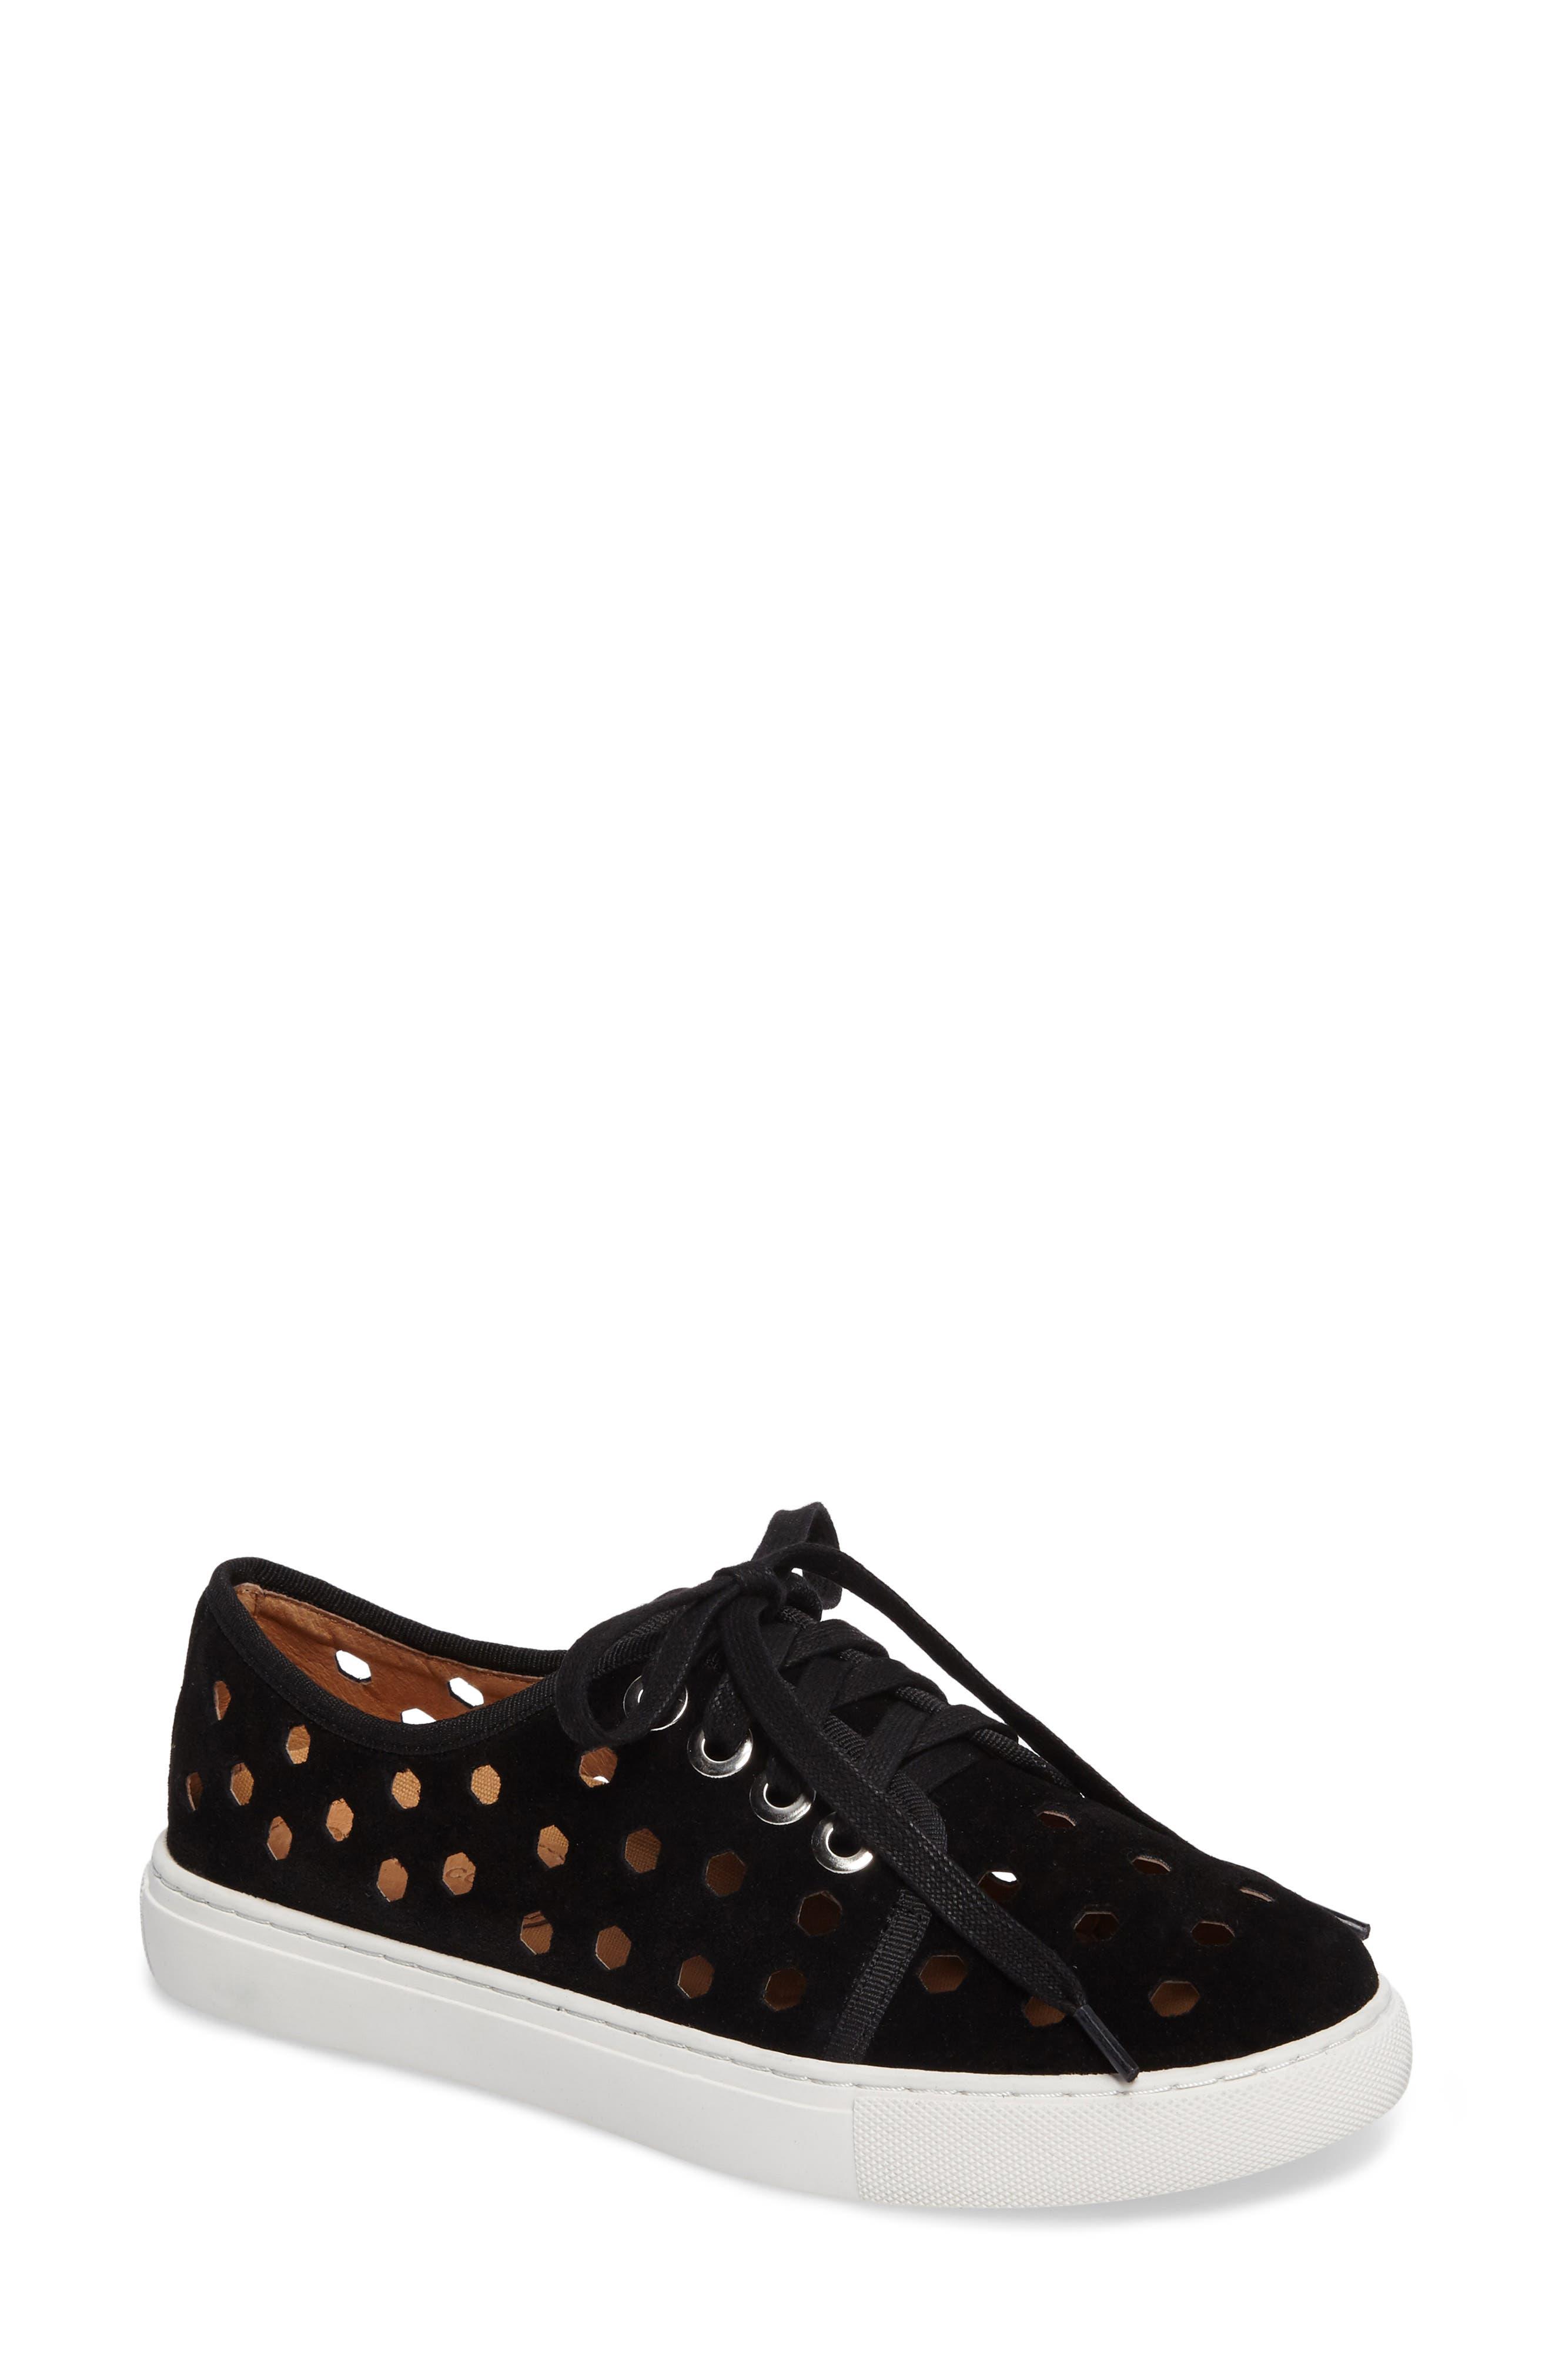 Main Image - Corso Como Rasta Perforated Sneaker (Women)